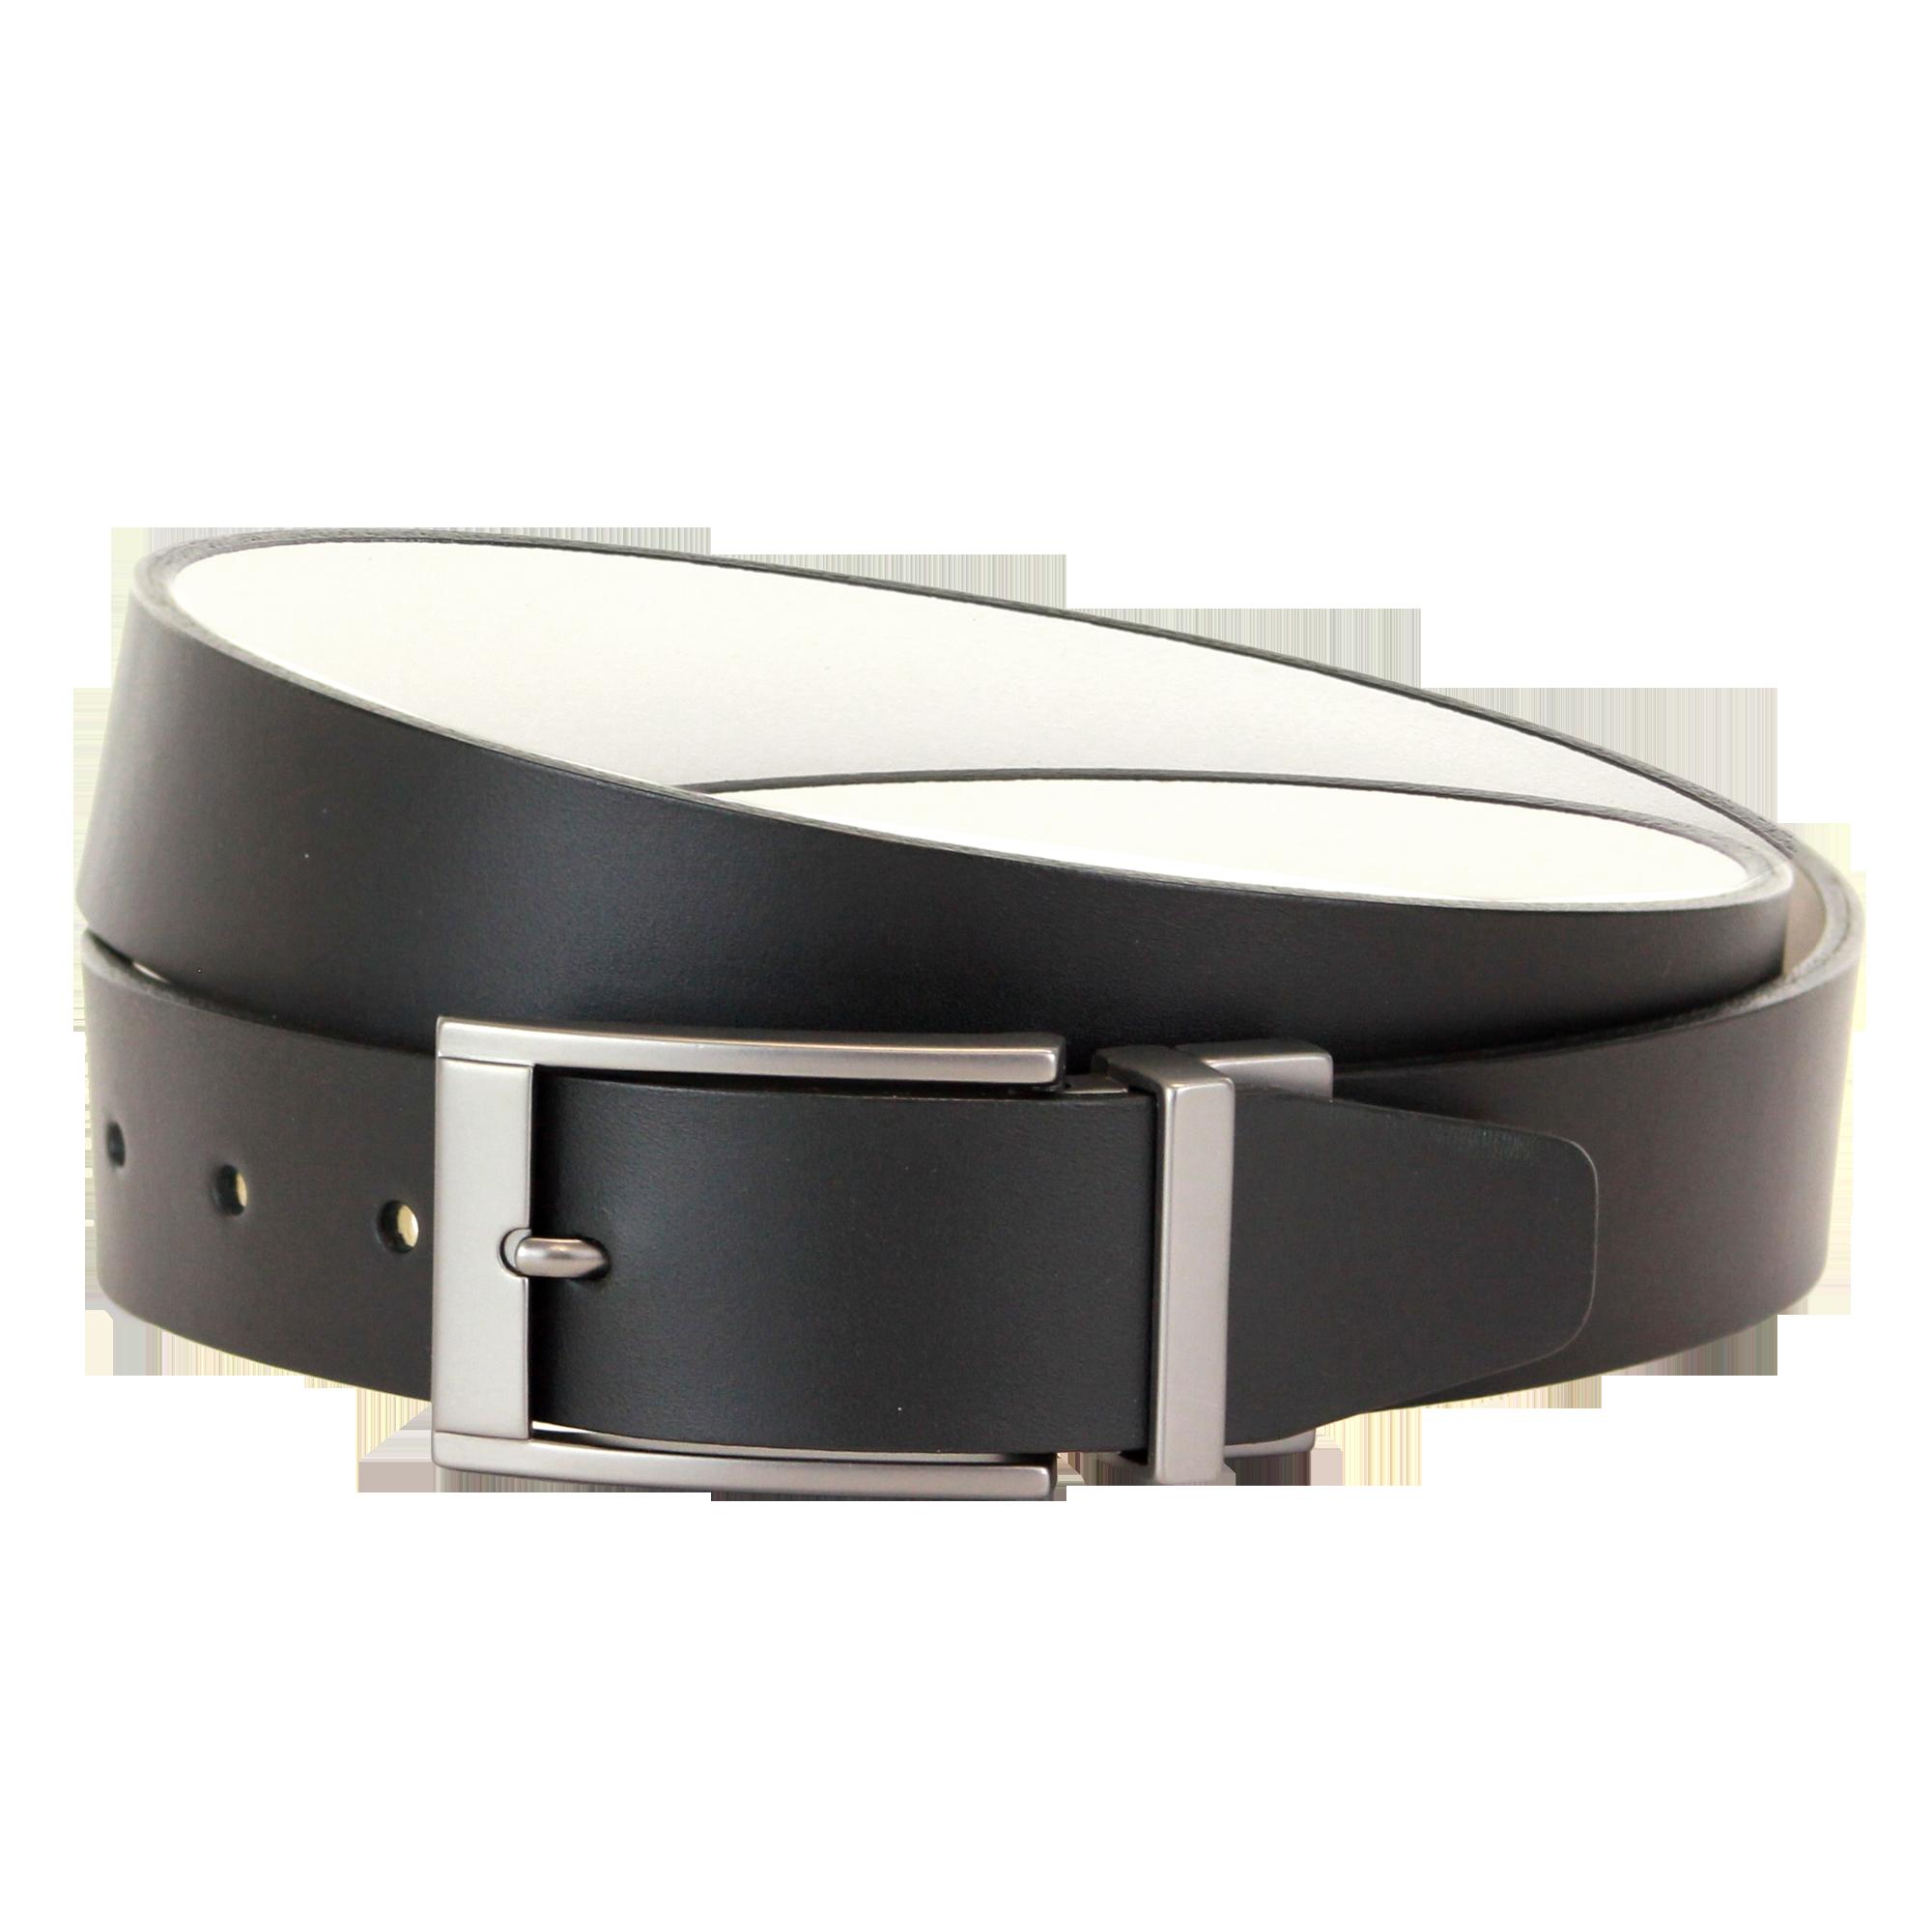 Ridlington Belt - Black & White PNG Image